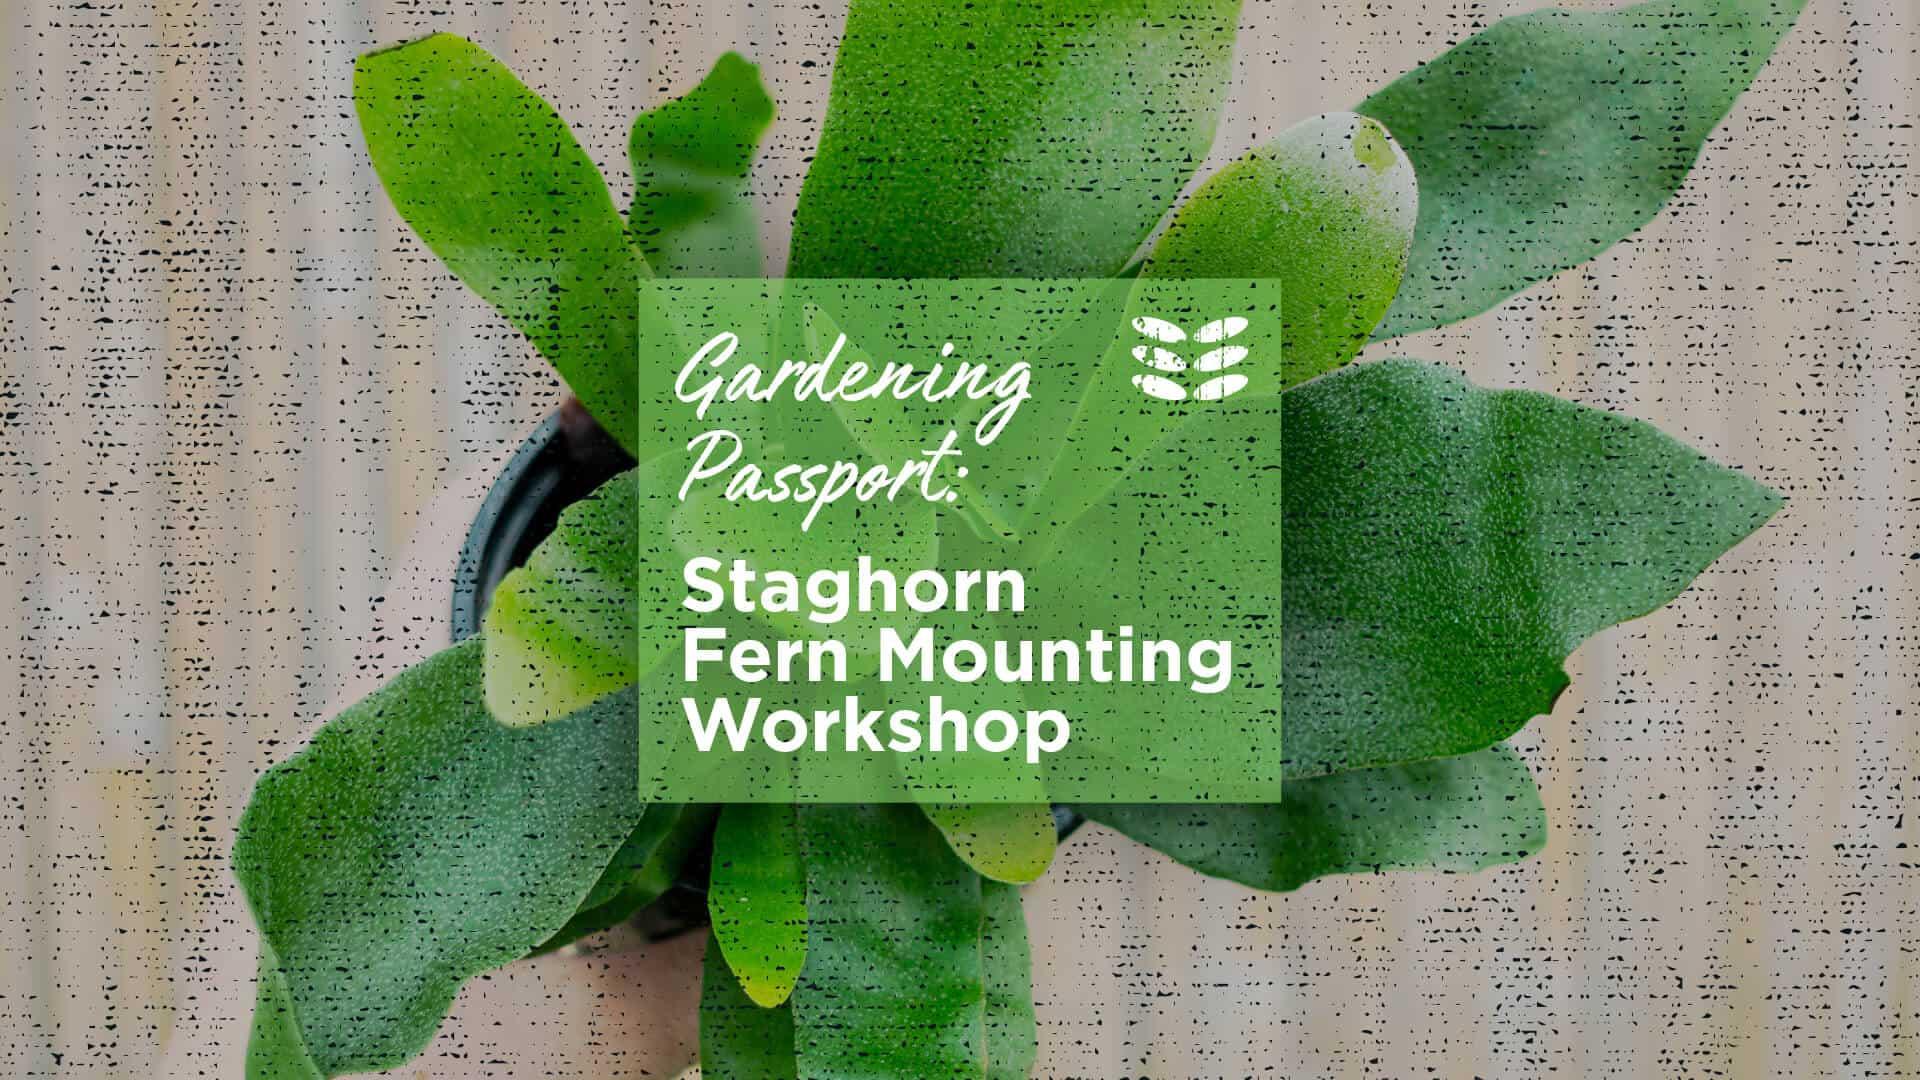 Staghorn Fern Mounting Workshop Sept 19th